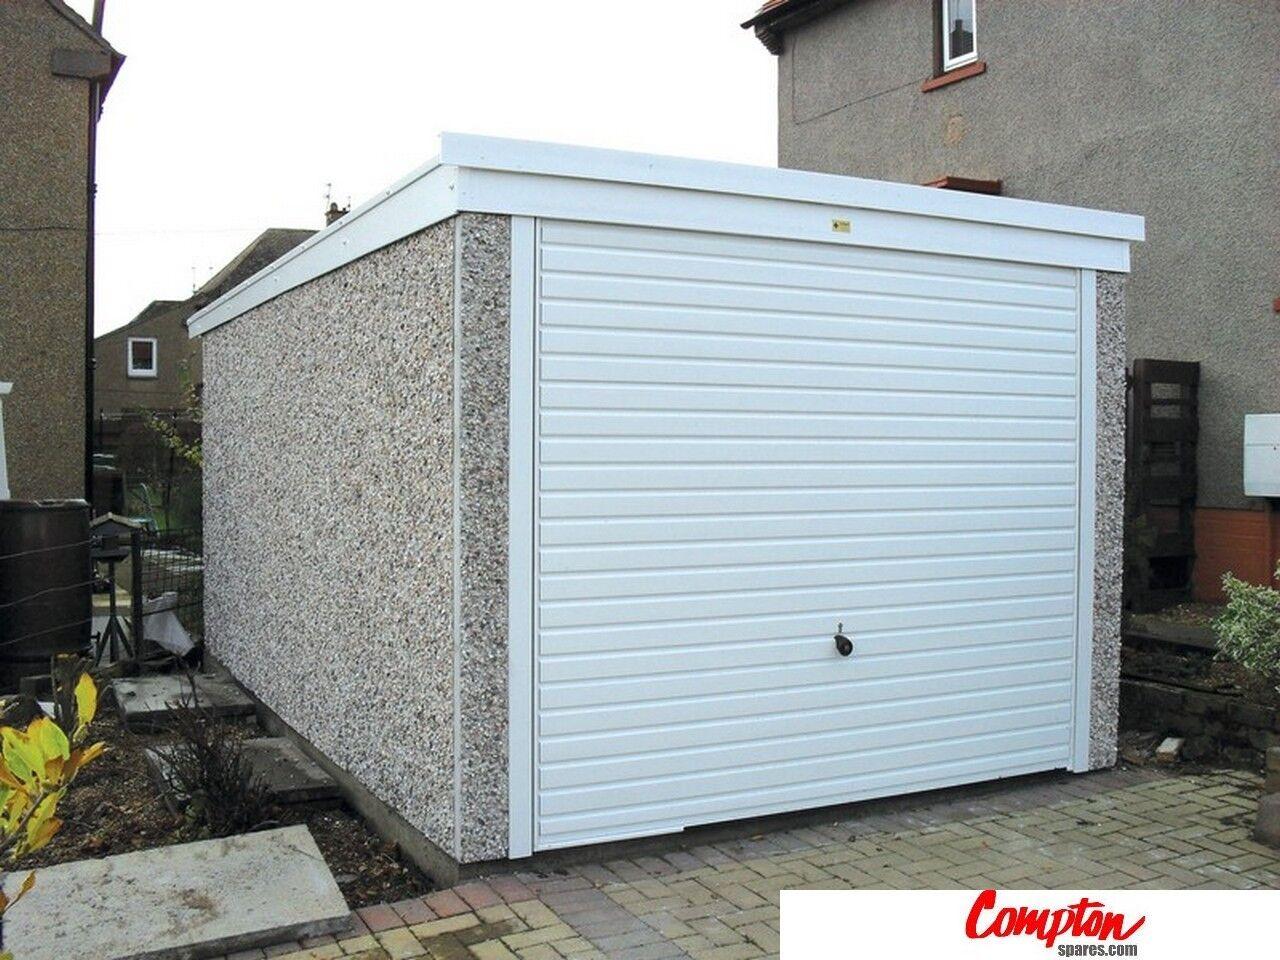 Prefab Garages Buildings Pvc Pent 8ft6in X 16ft3in Ebay